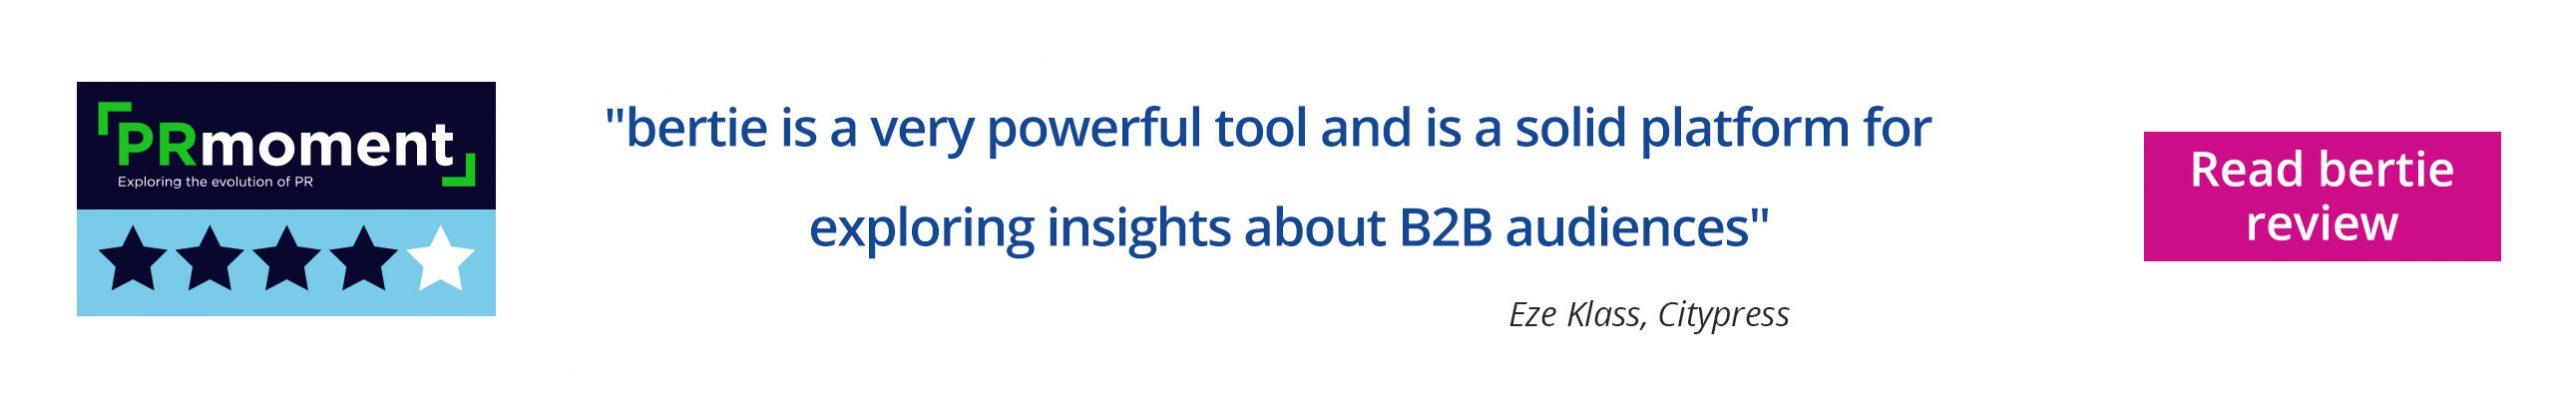 delineate bertie tool review